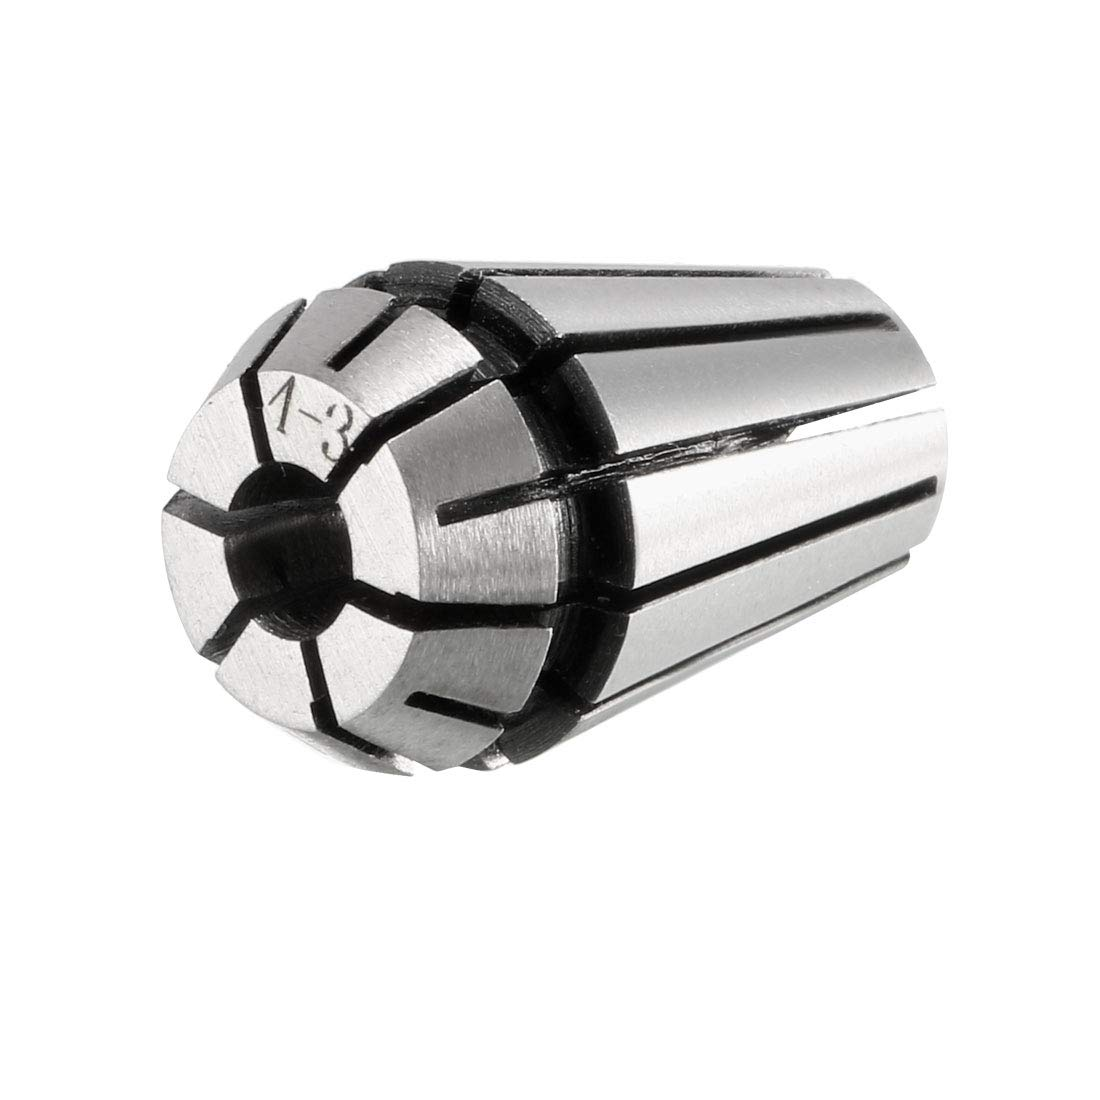 TiAlN Carbide RH Cut WIDIA Hanita D0110800T016 VariMill D011 GP Roughing//Finishing End Mill Straight Shank 2-Flute 8 mm Cutting Dia Ball Nose